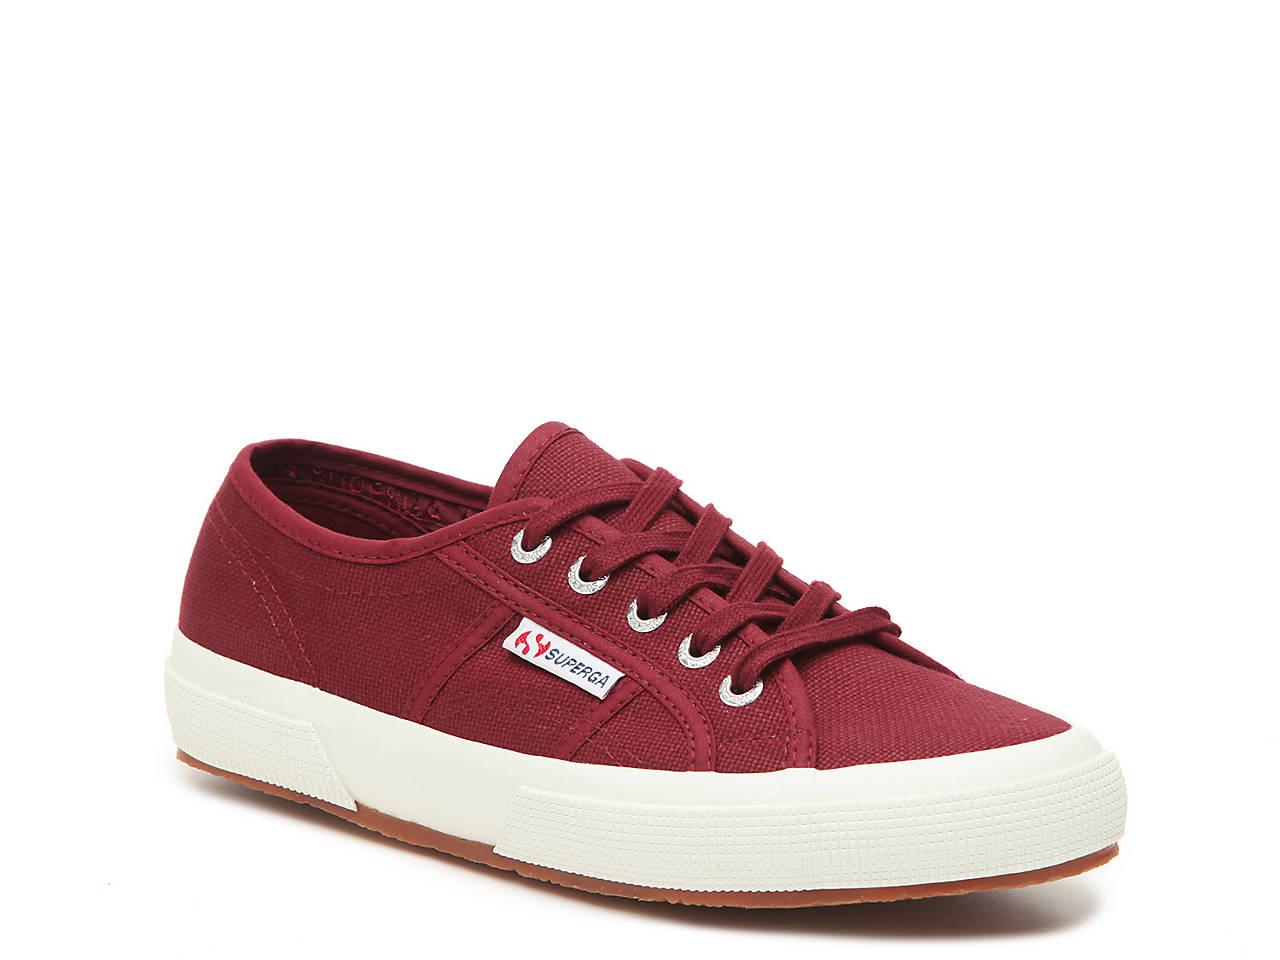 8e34404785e Superga 2750 Cotu Classic Sneaker Men s Shoes